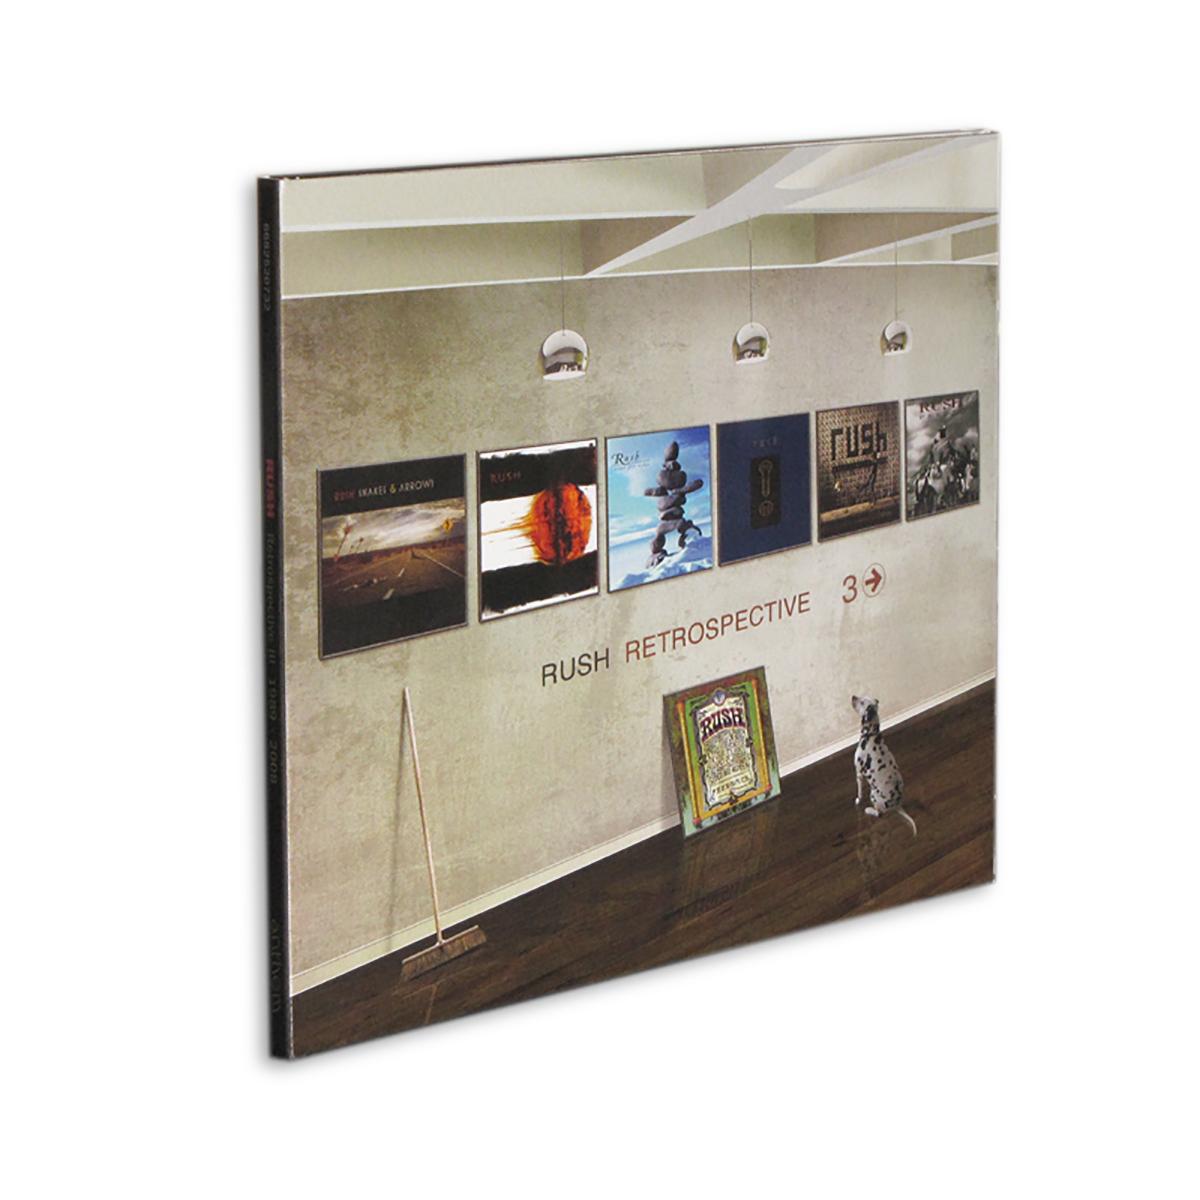 CD/DVD Combo - Rush Retrospective III